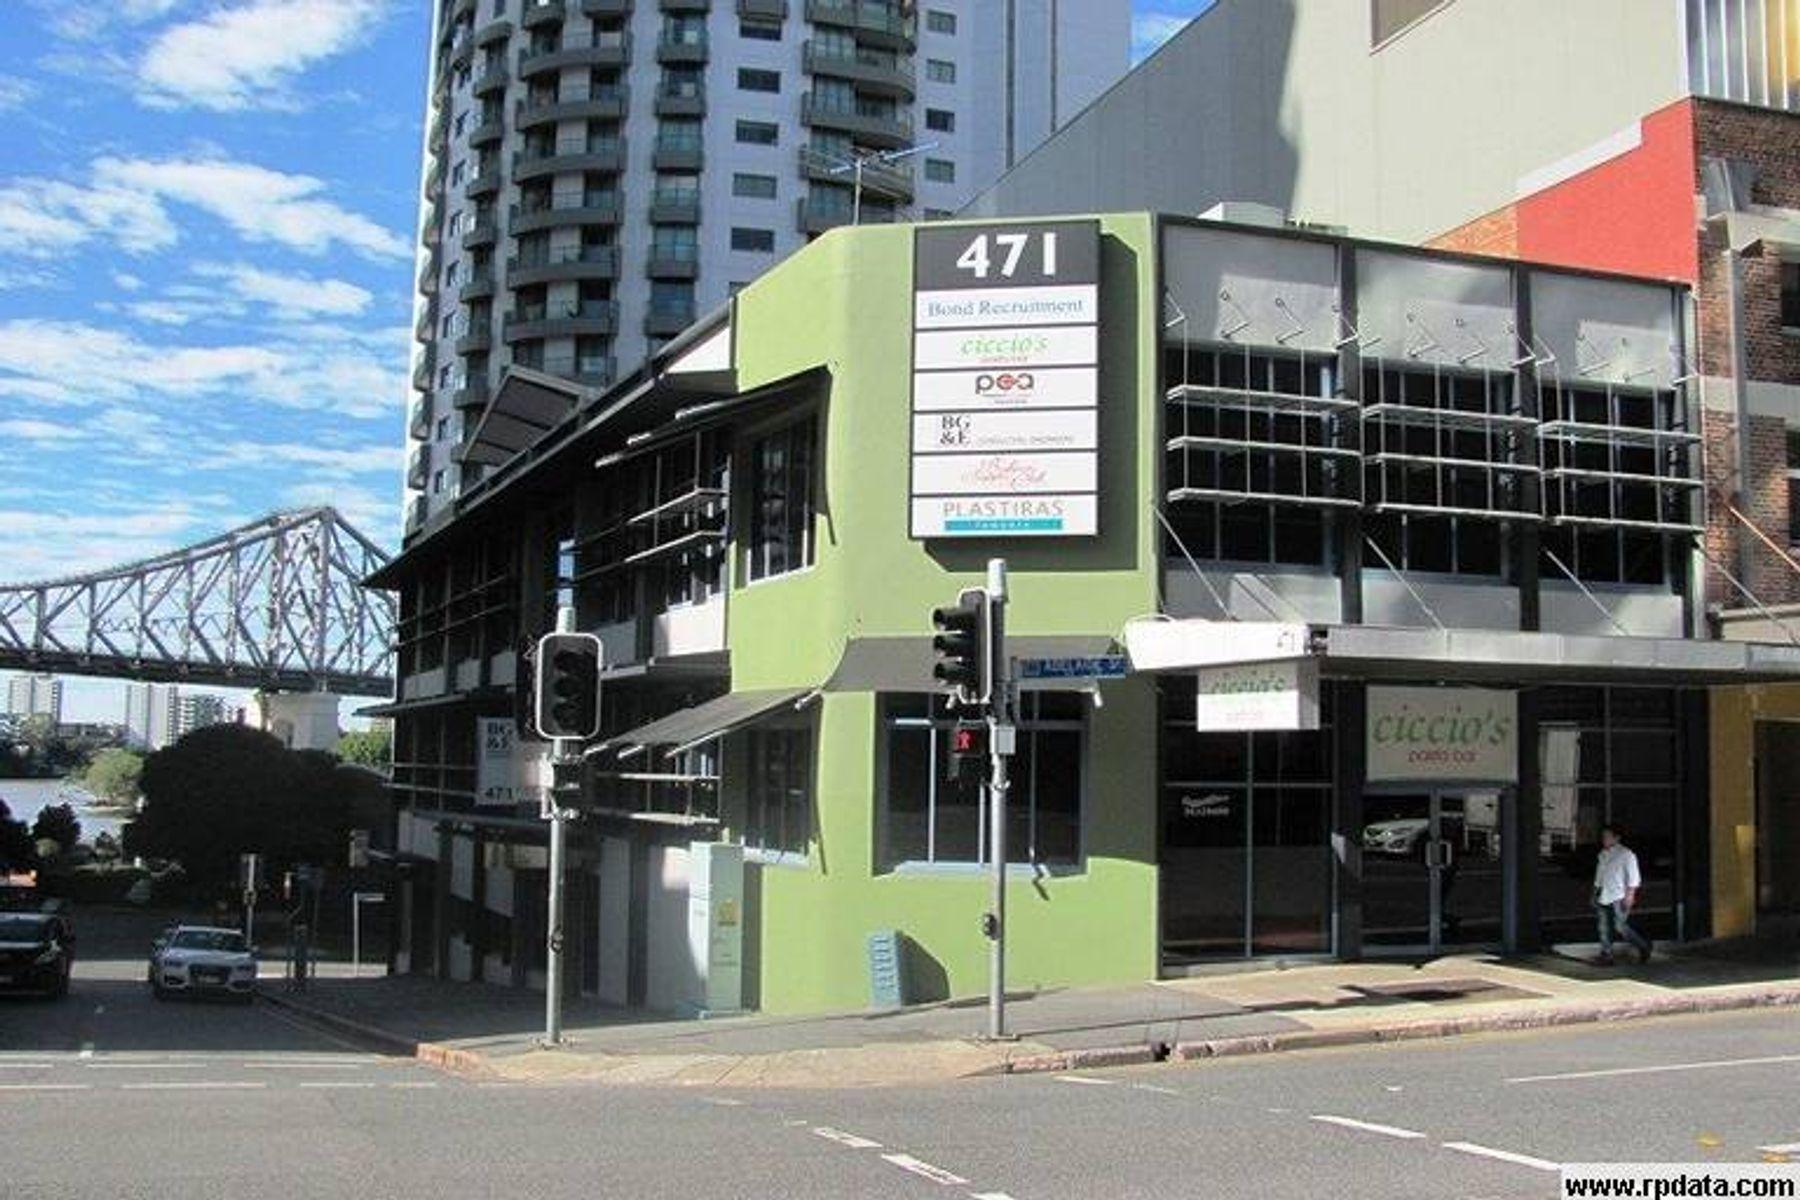 301/471 Adelaide Street, Brisbane City, QLD 4000